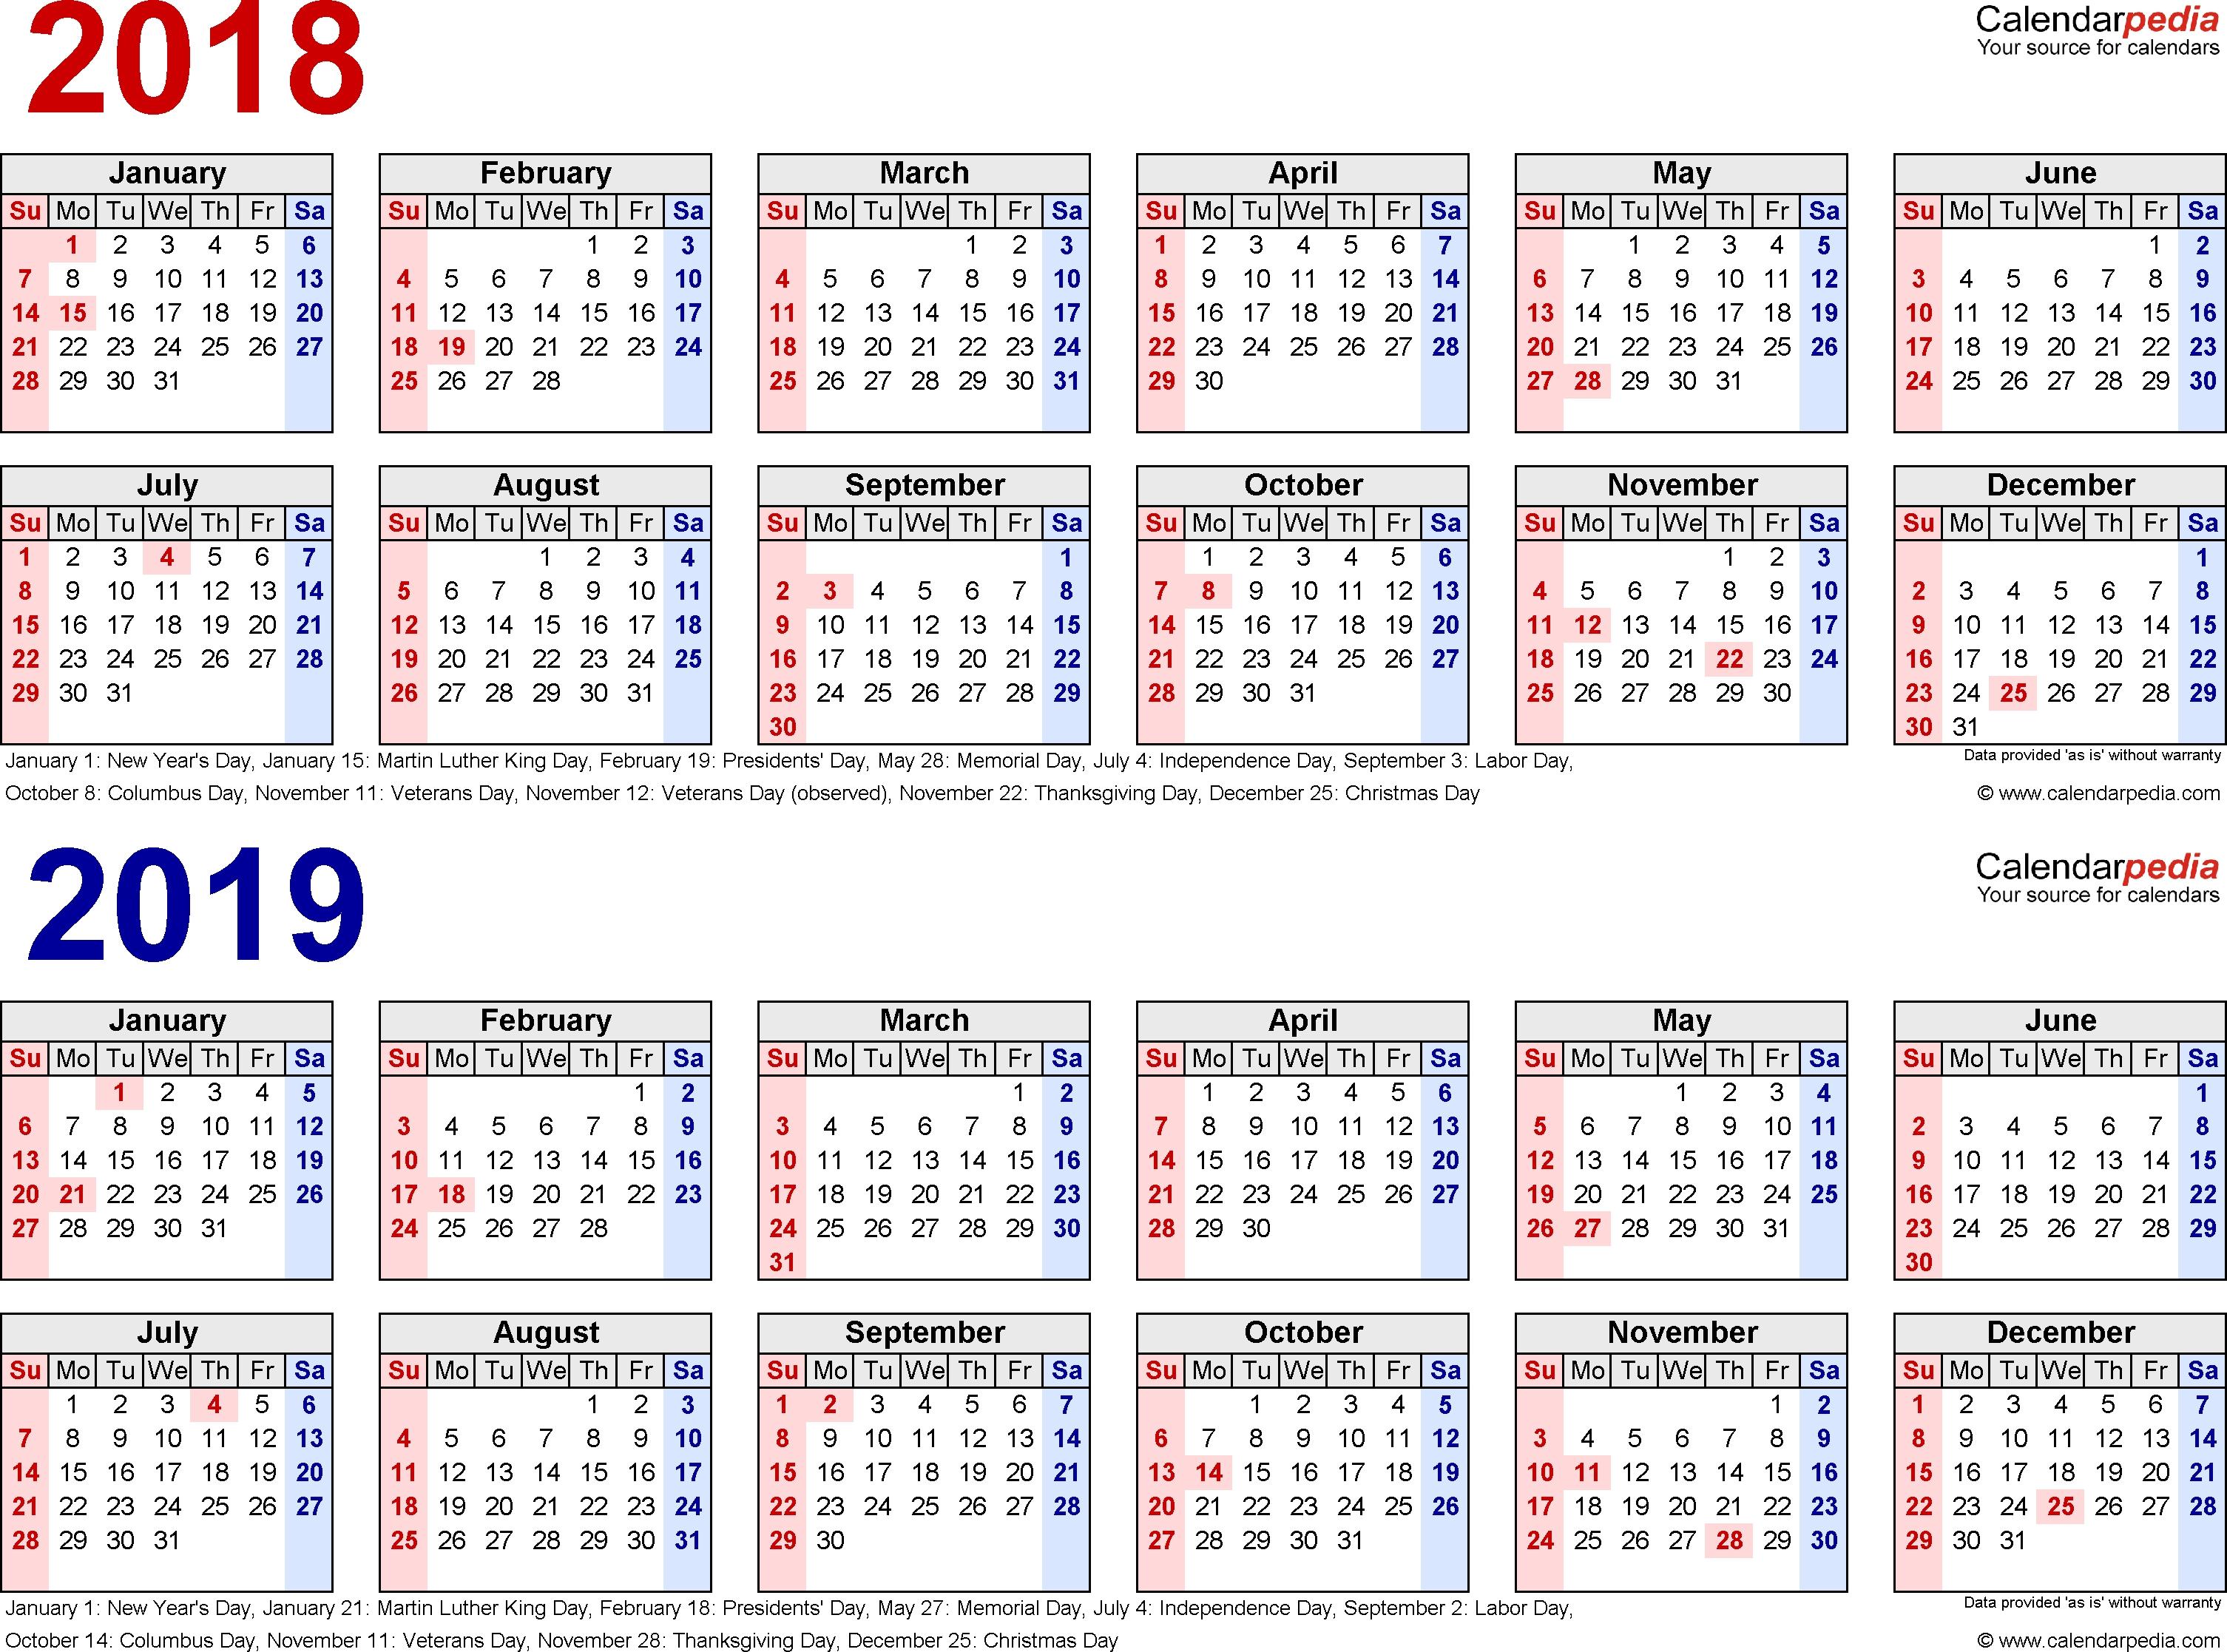 Image Result For Free Printable 2018 /2019 Calendar   Printable Calendar 2019 Za Printanje